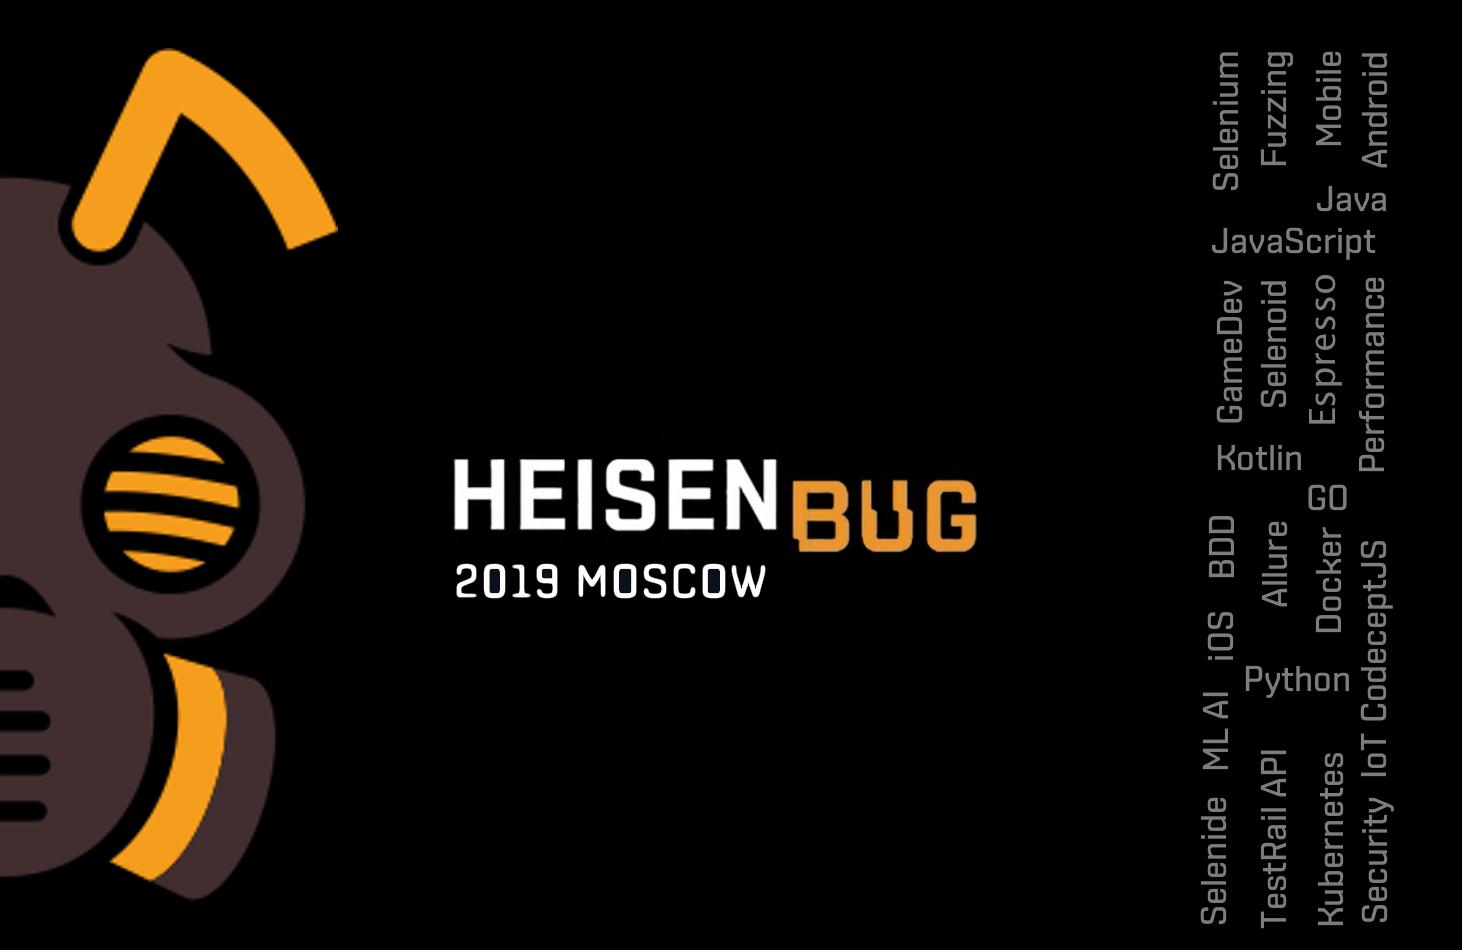 Tоп-10: лучшие доклады Heisenbug 2019 Moscow - 1